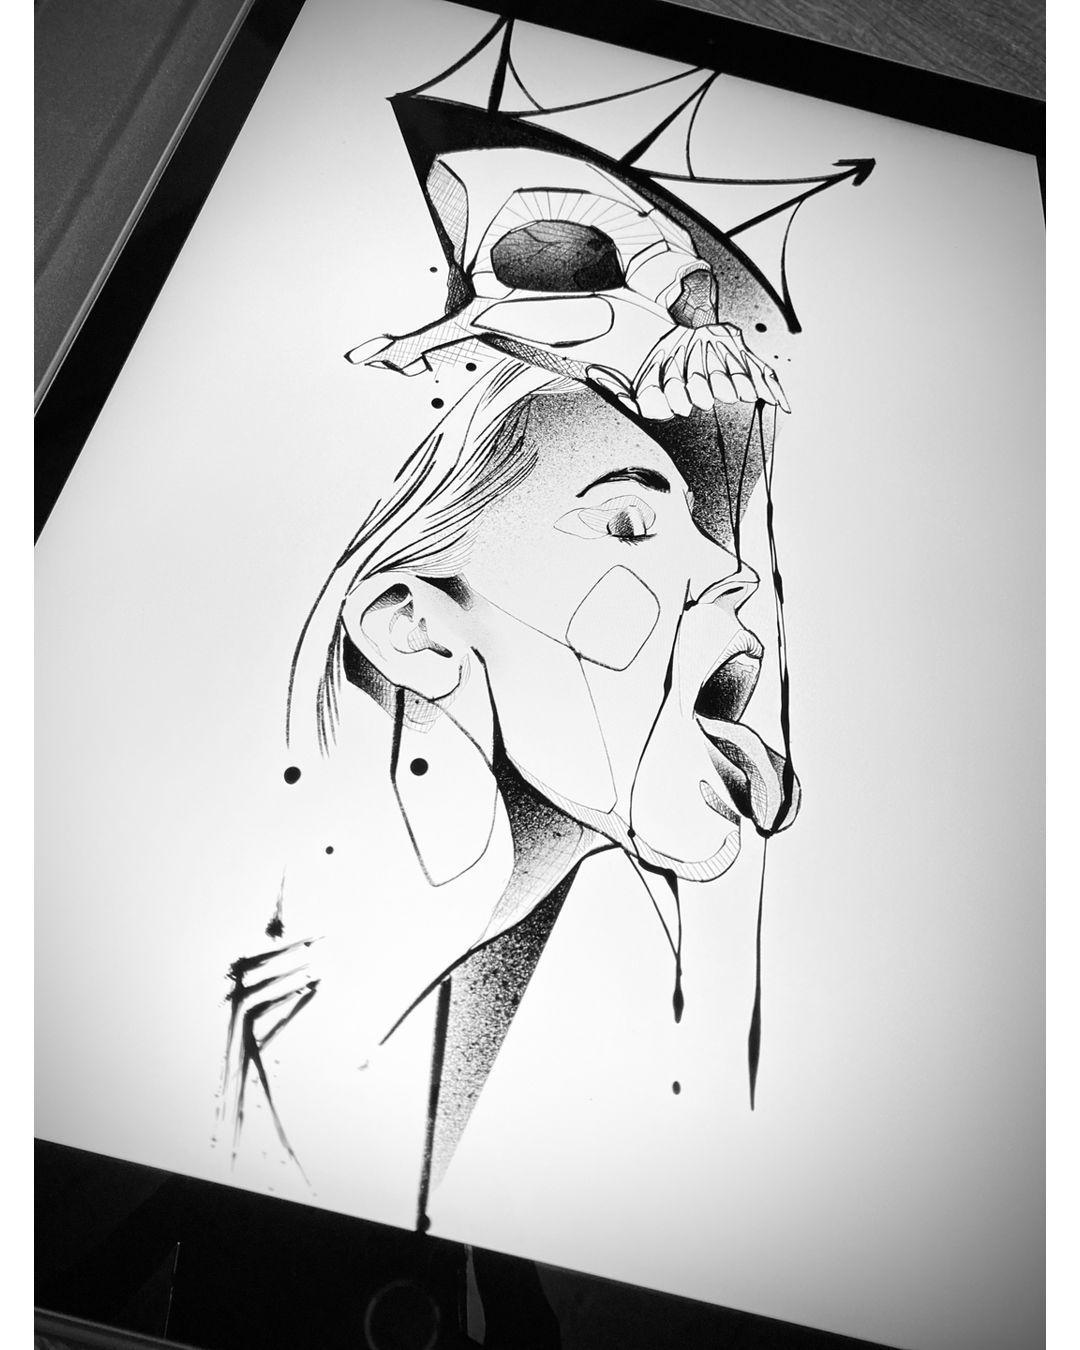 Concept available. 2021 Book your appointment: DM or flavio@flaviorezende.com ⠀ #tattooforgirls #iblackwork #blacktattoing #blackworkerssubmission #darkartists #tattoodo #blackworkartists #blackwork #thebesttattooartists #inspirationtatto #tattooartistmagazine #thinkbeforeuink #Equilattera #tattrx #inkedmag #tattooartists #stencilstuff #art_spotlight #torontotattoo #tattootoronto #blacktattoo #floraltattoo